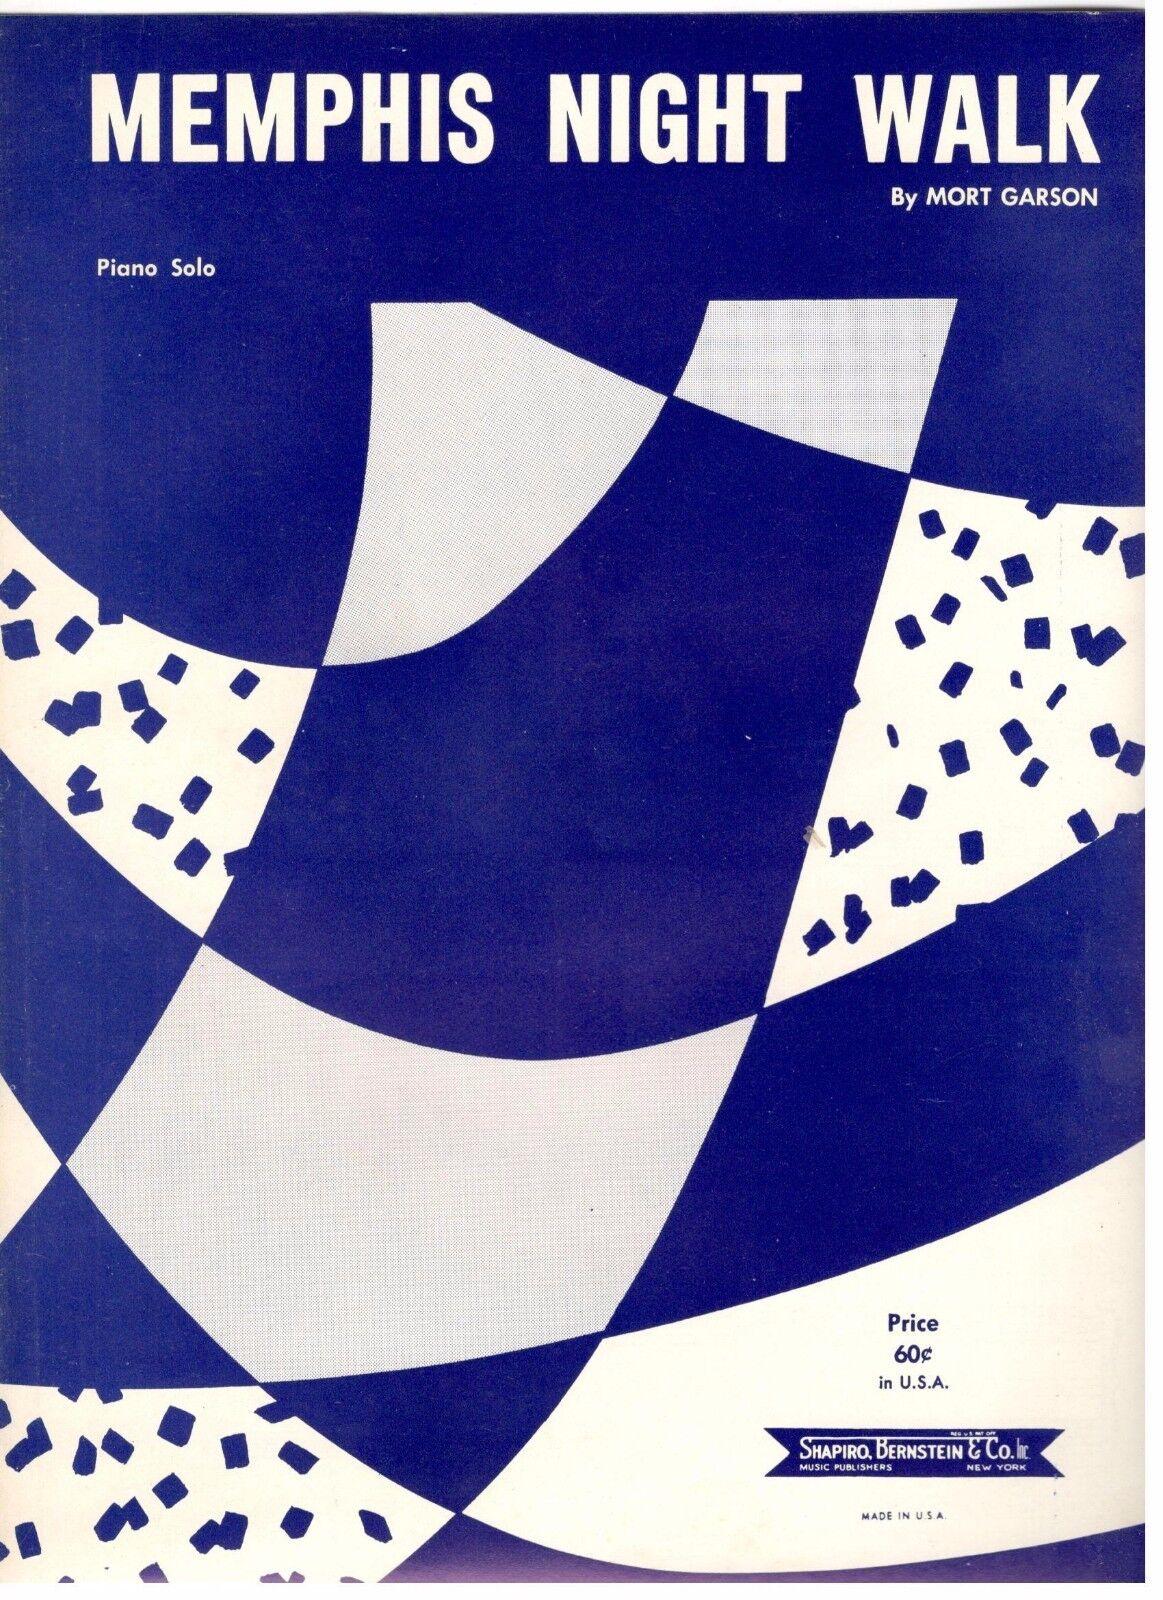 MEMPHIS NIGHT WALK  PIANO SOLO SHEET MUSIC-1959-BRAND NEW-RARE-MINT CONDITION